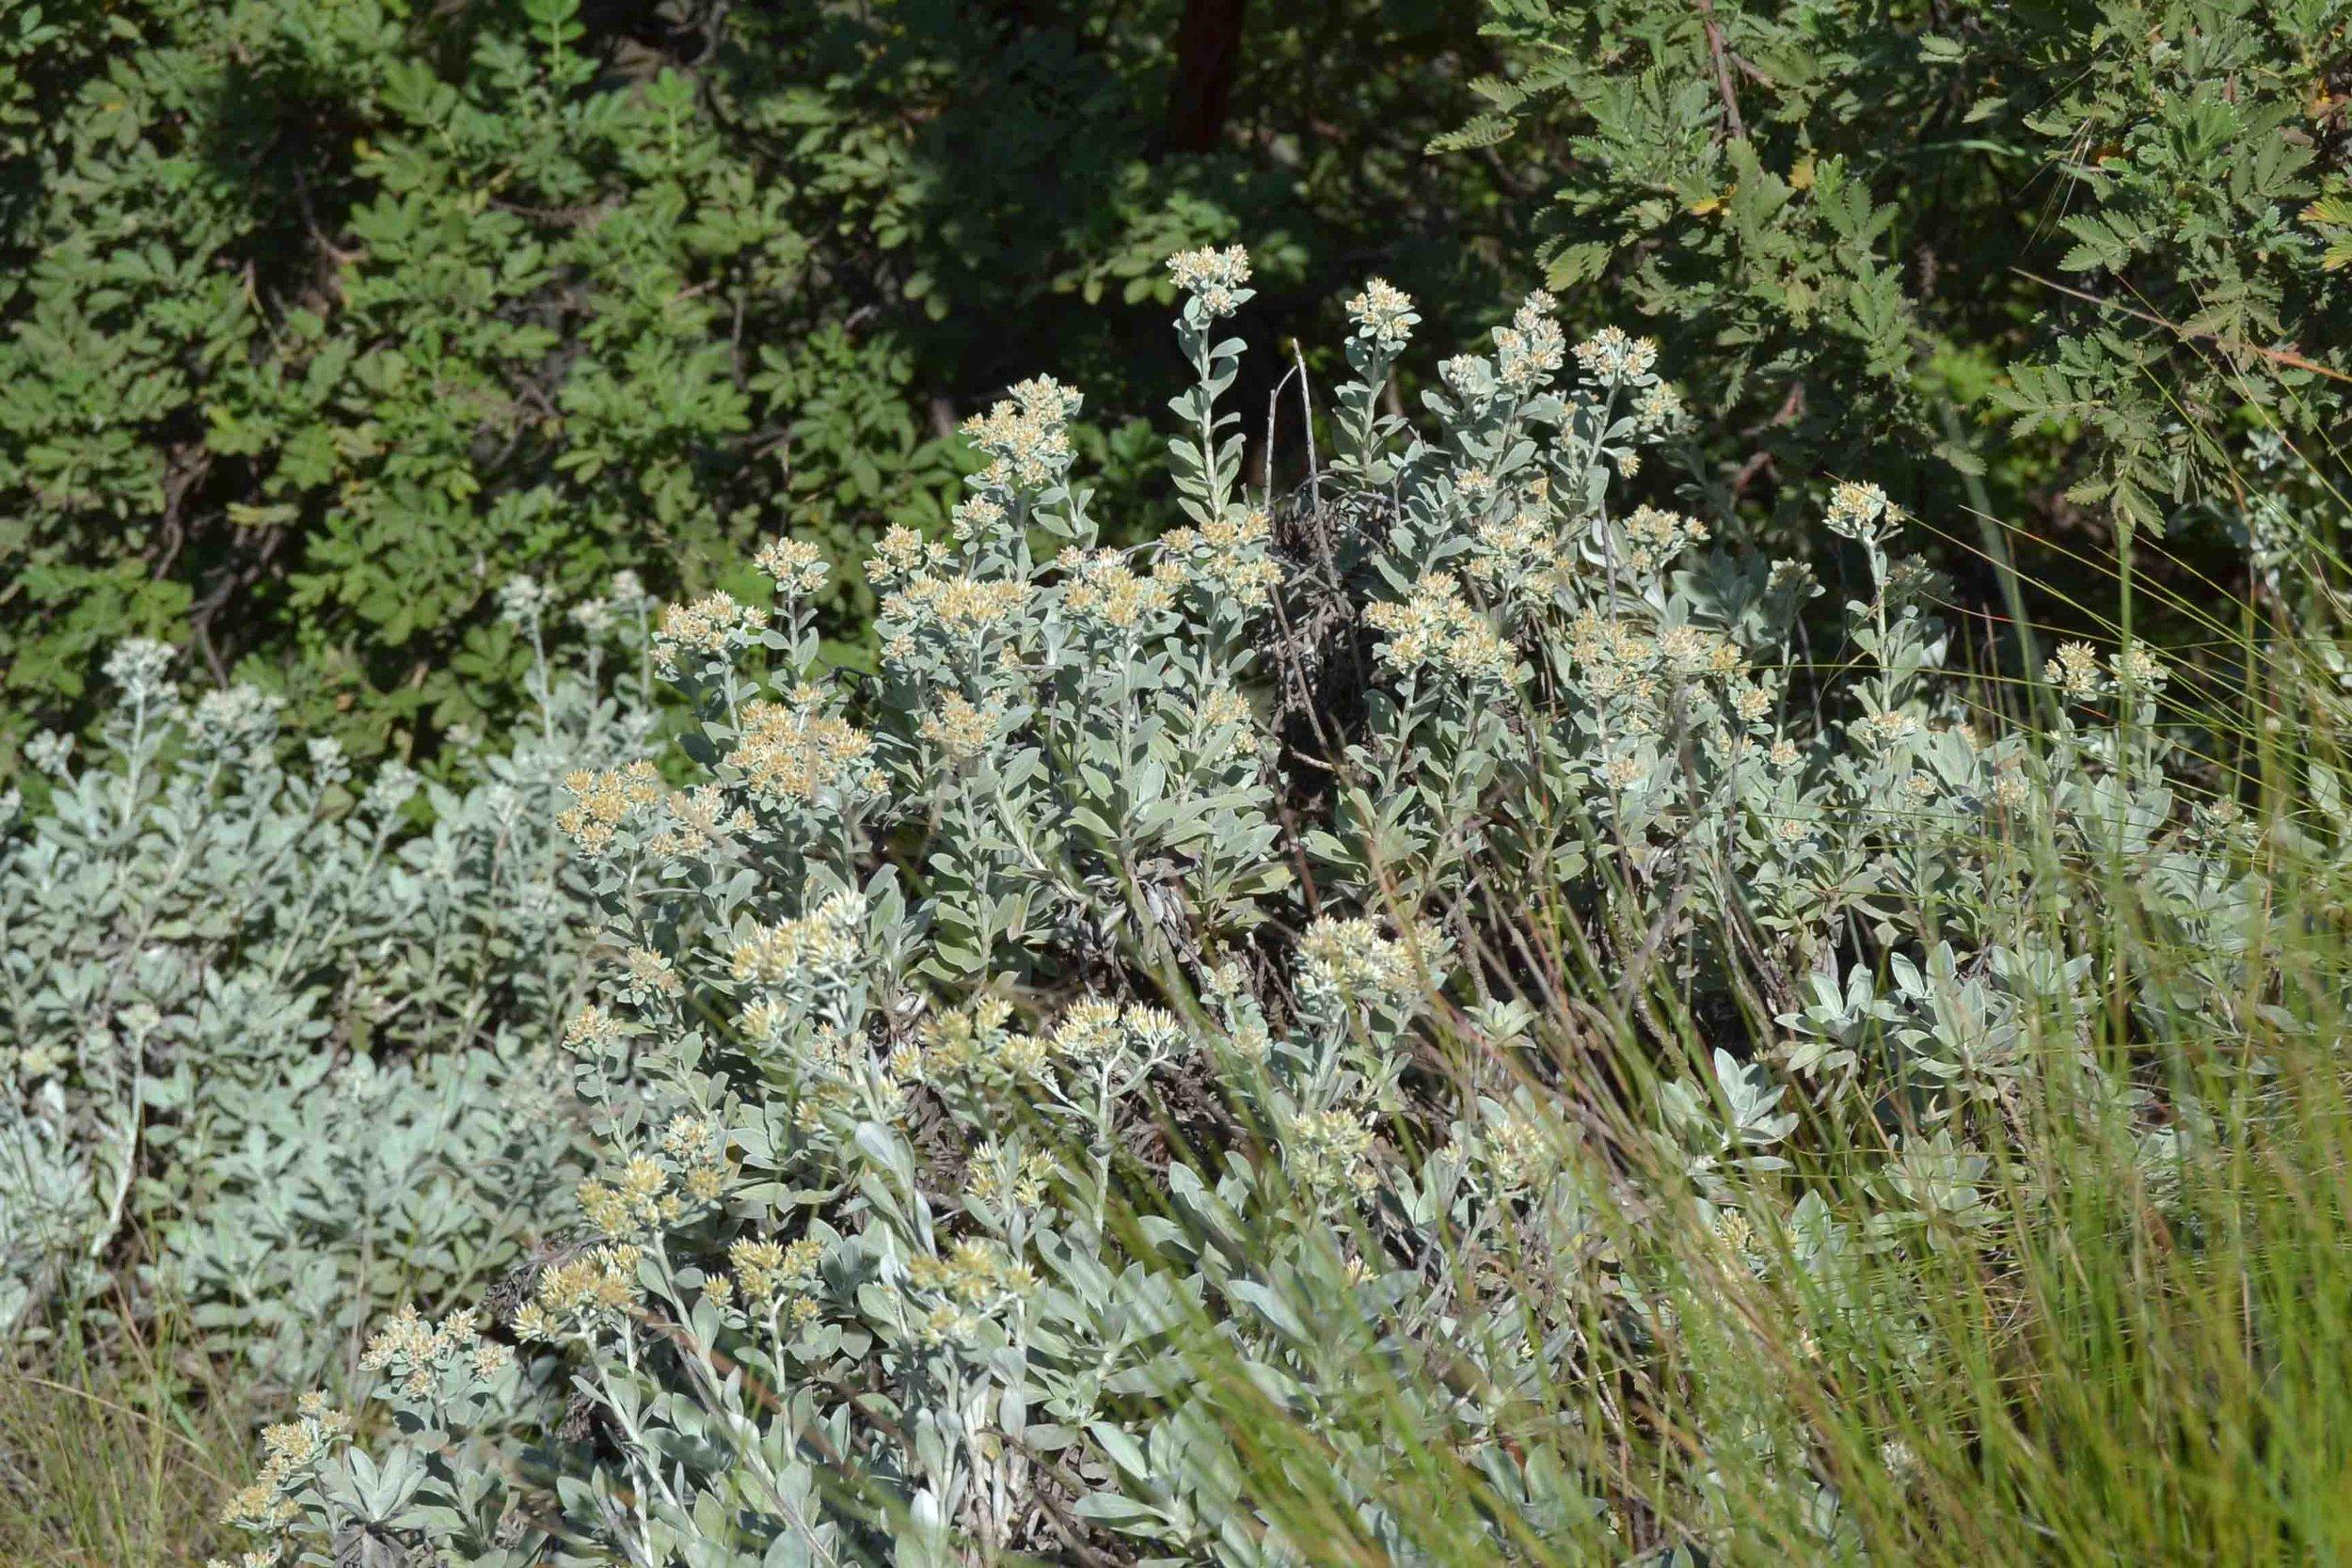 Helichrysum sutherlandii  - look at this wonderful grey foliage